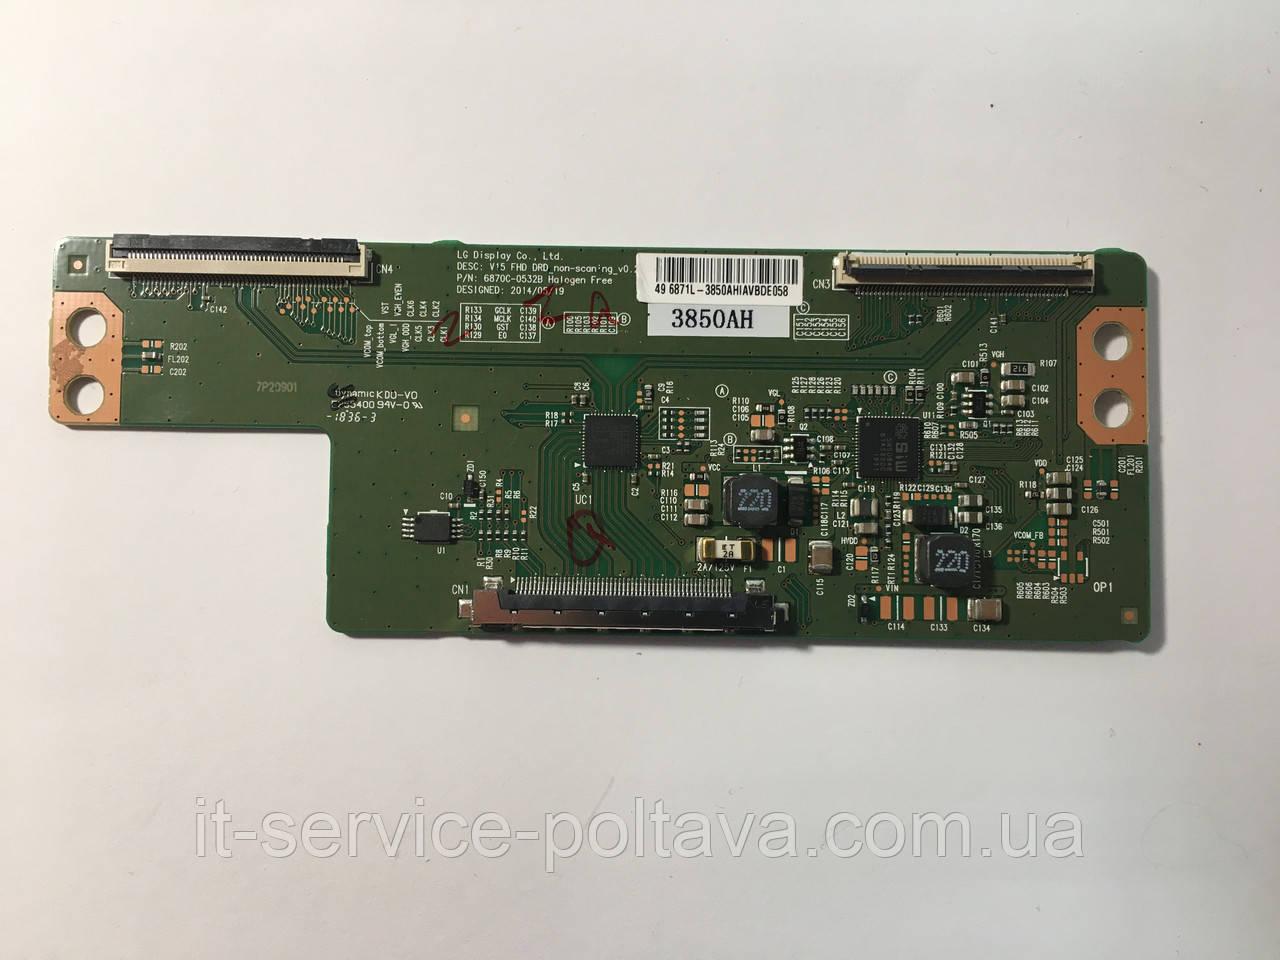 Плата T-CON 6870C-0532В  V 15 FHD DRD_non-sconing_v0.2